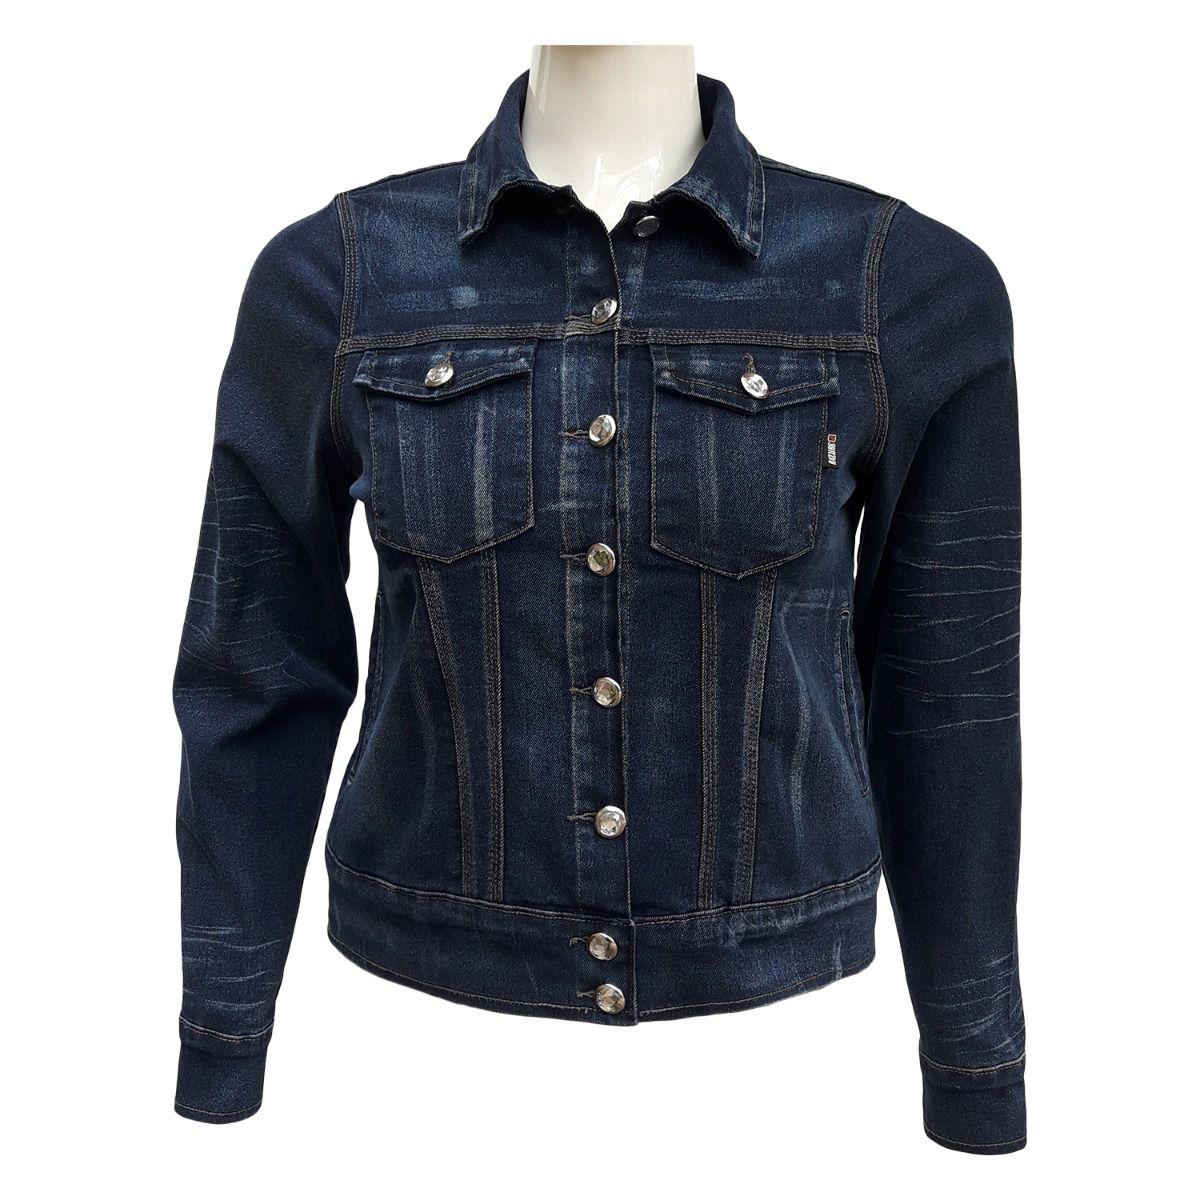 Jaqueta Jeans Feminina Cós Largo Plus Size